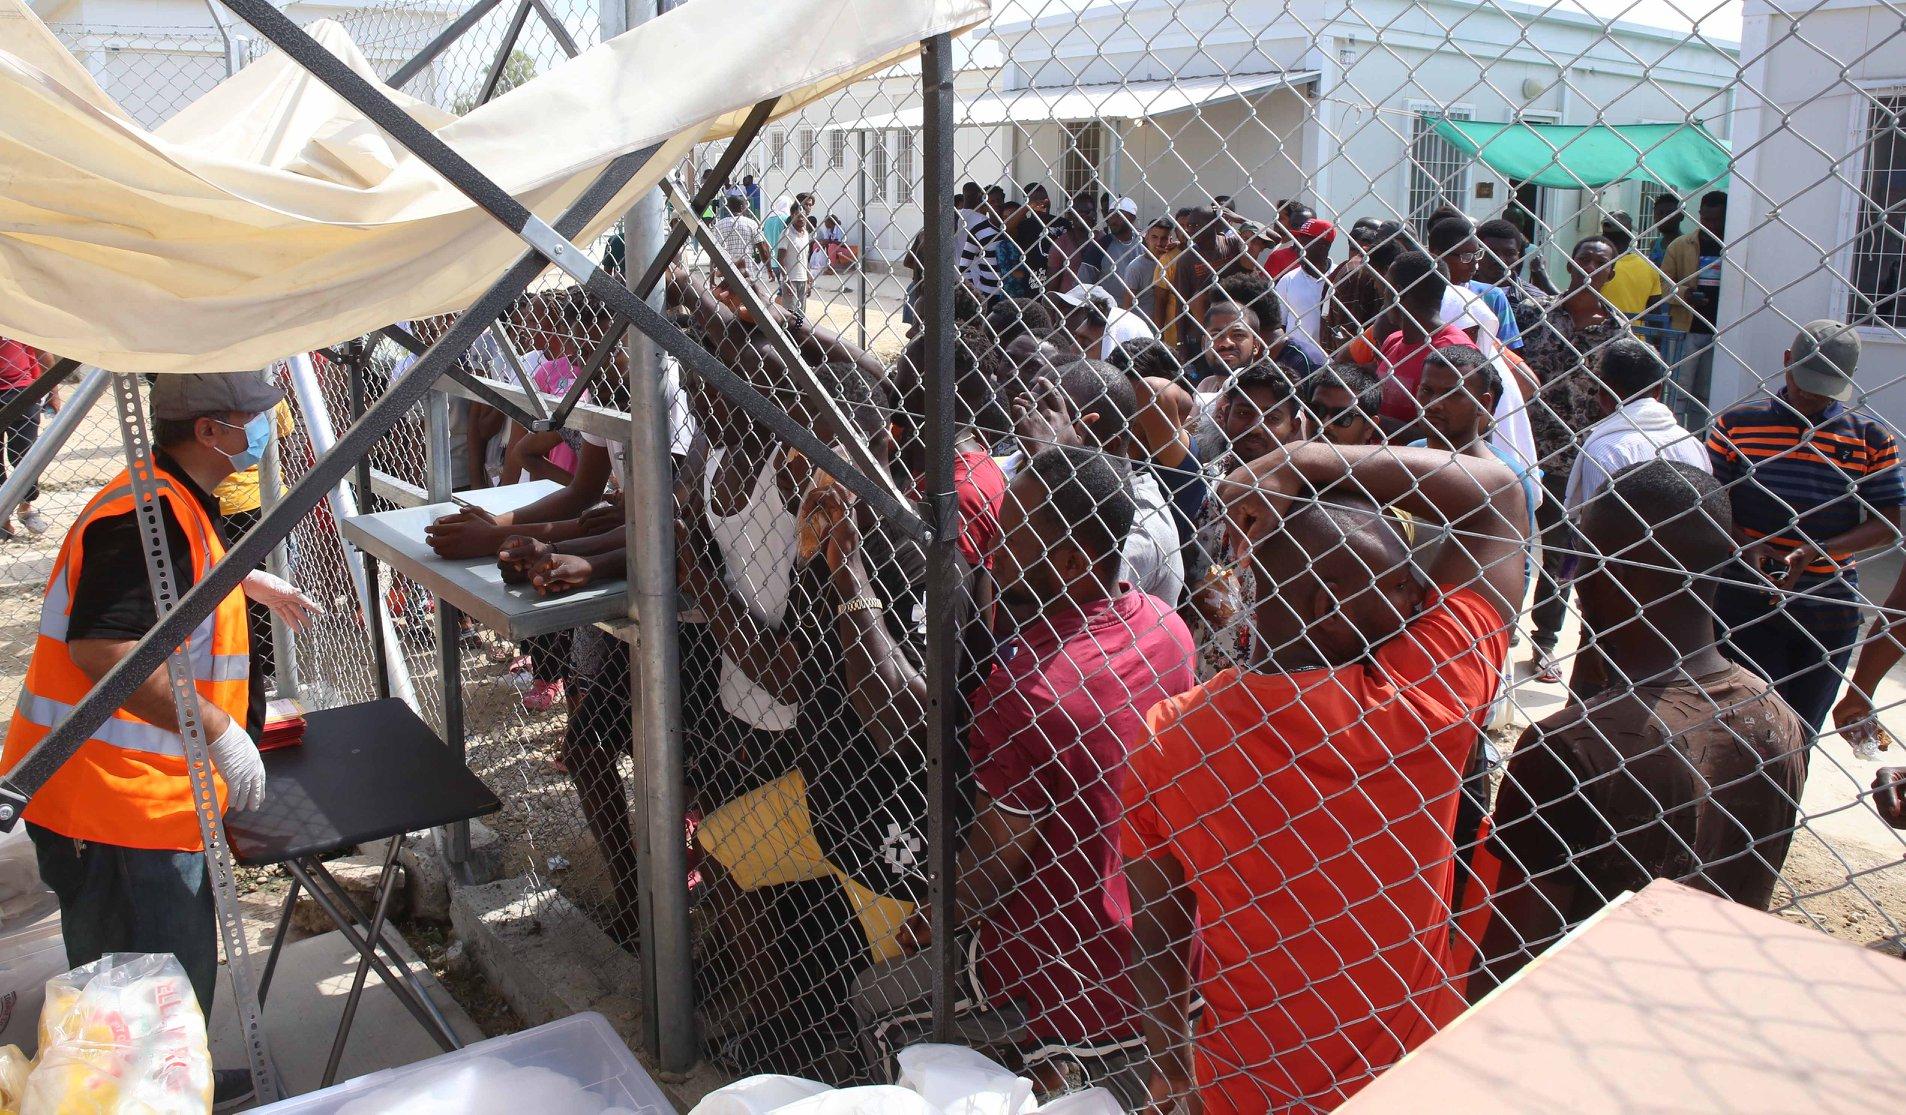 The Pournara camp in Kokkinotrimithia, Cyprus was built to host asylum seekers for a maximum of 72 hoursParikiaki | Parikiaki Cyprus and Cypriot News